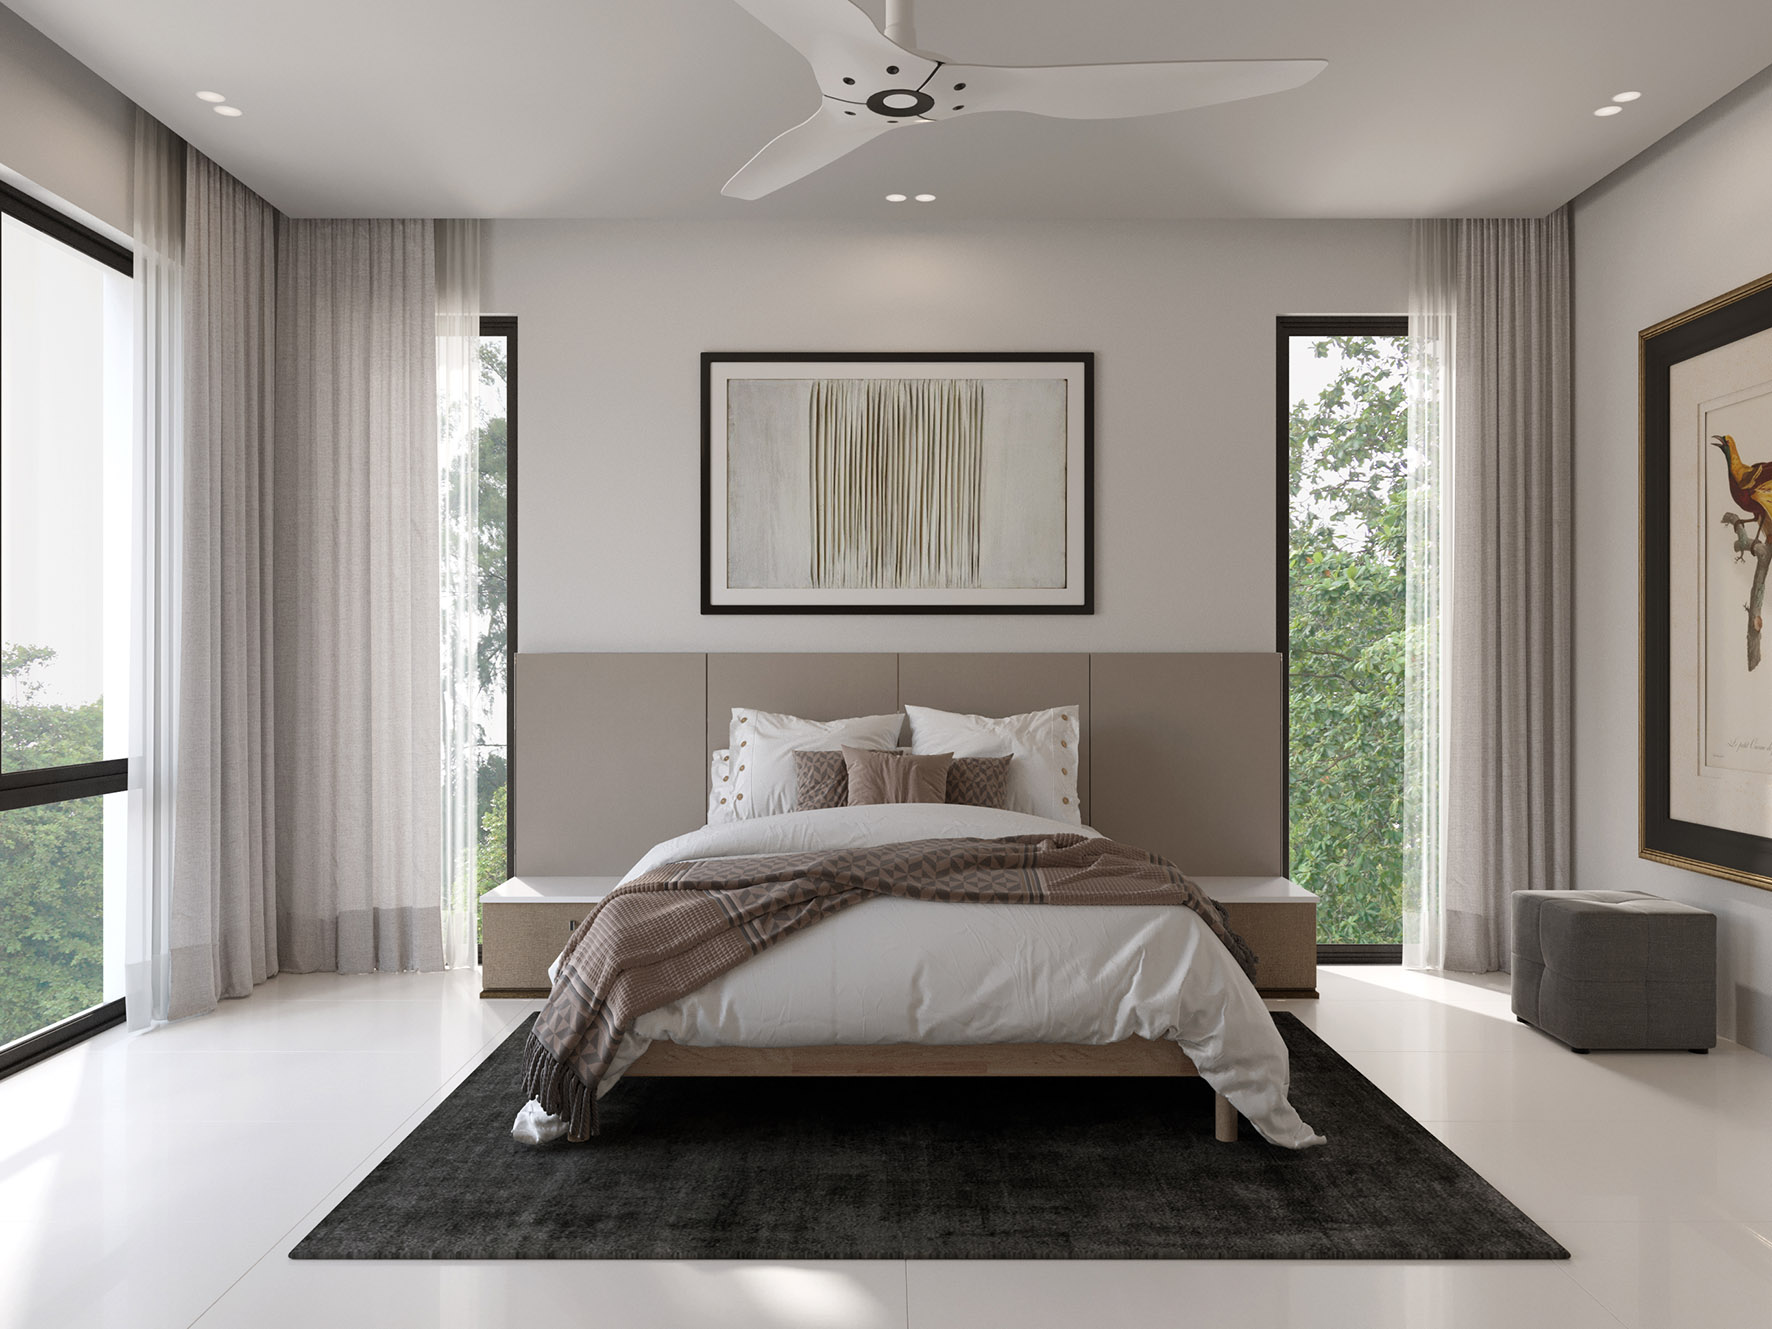 LV307 Bedroom 4